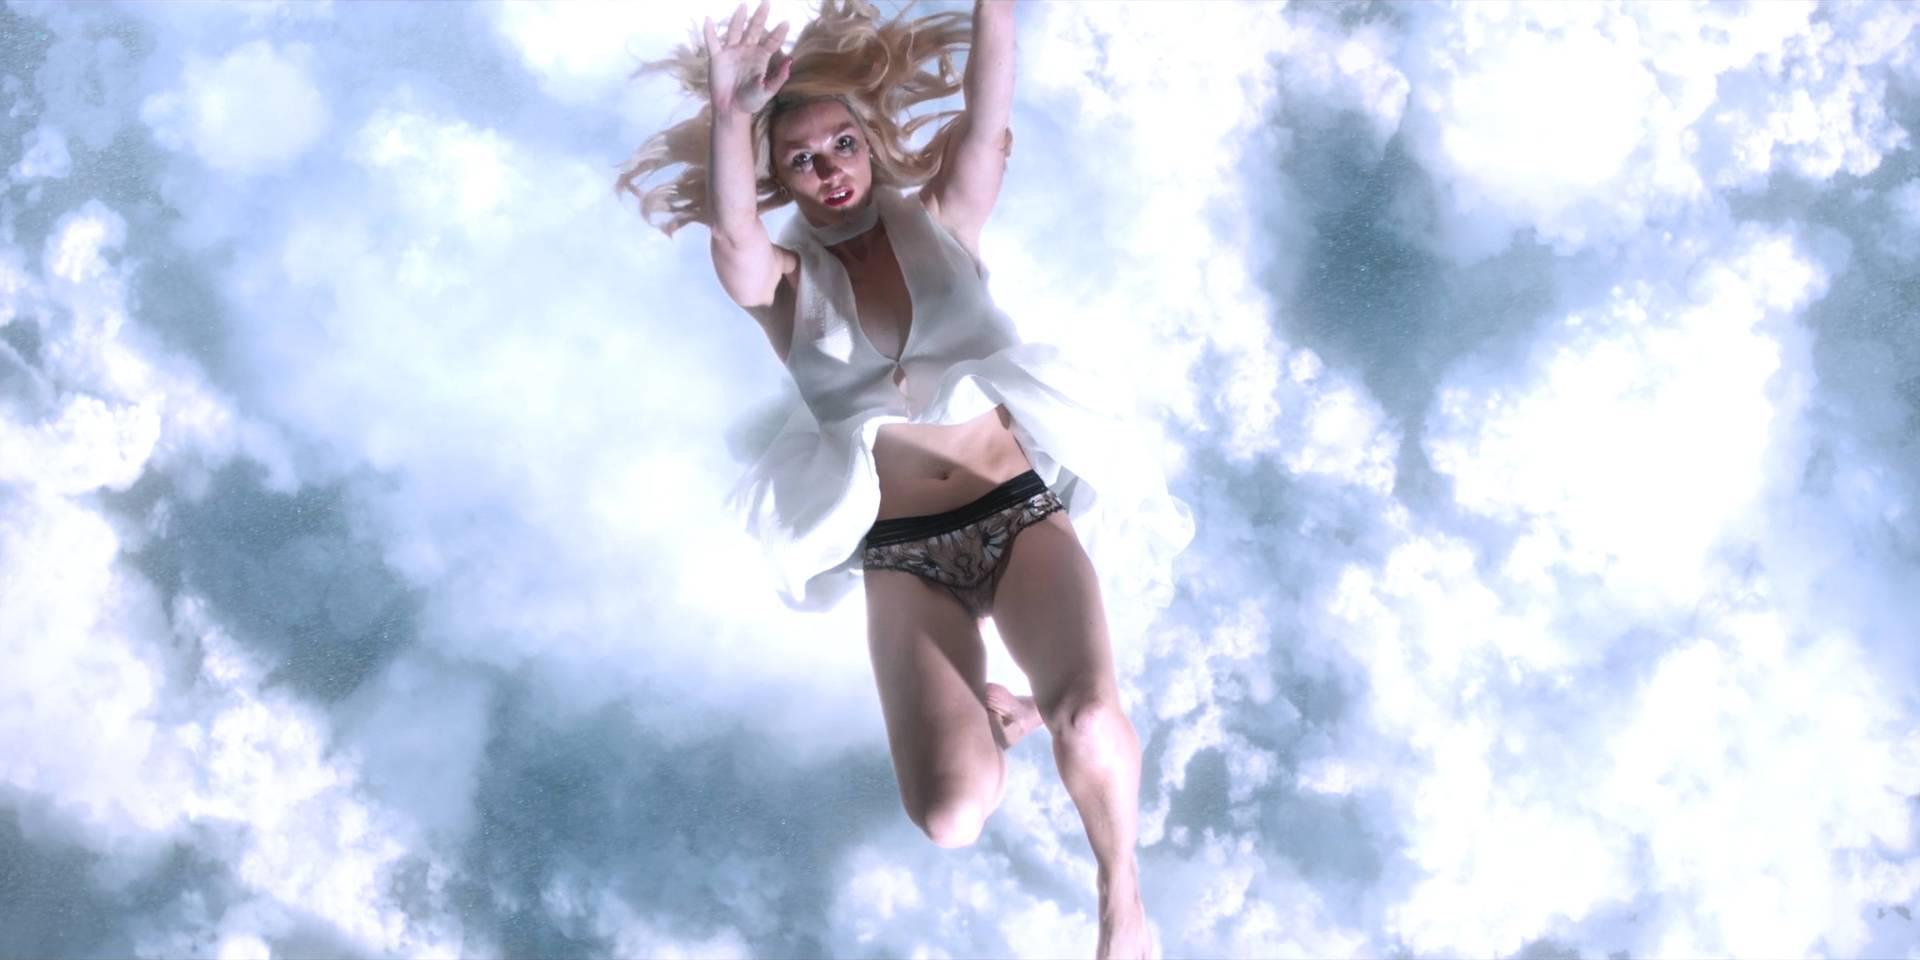 Martha higareda nude altered carbon 9